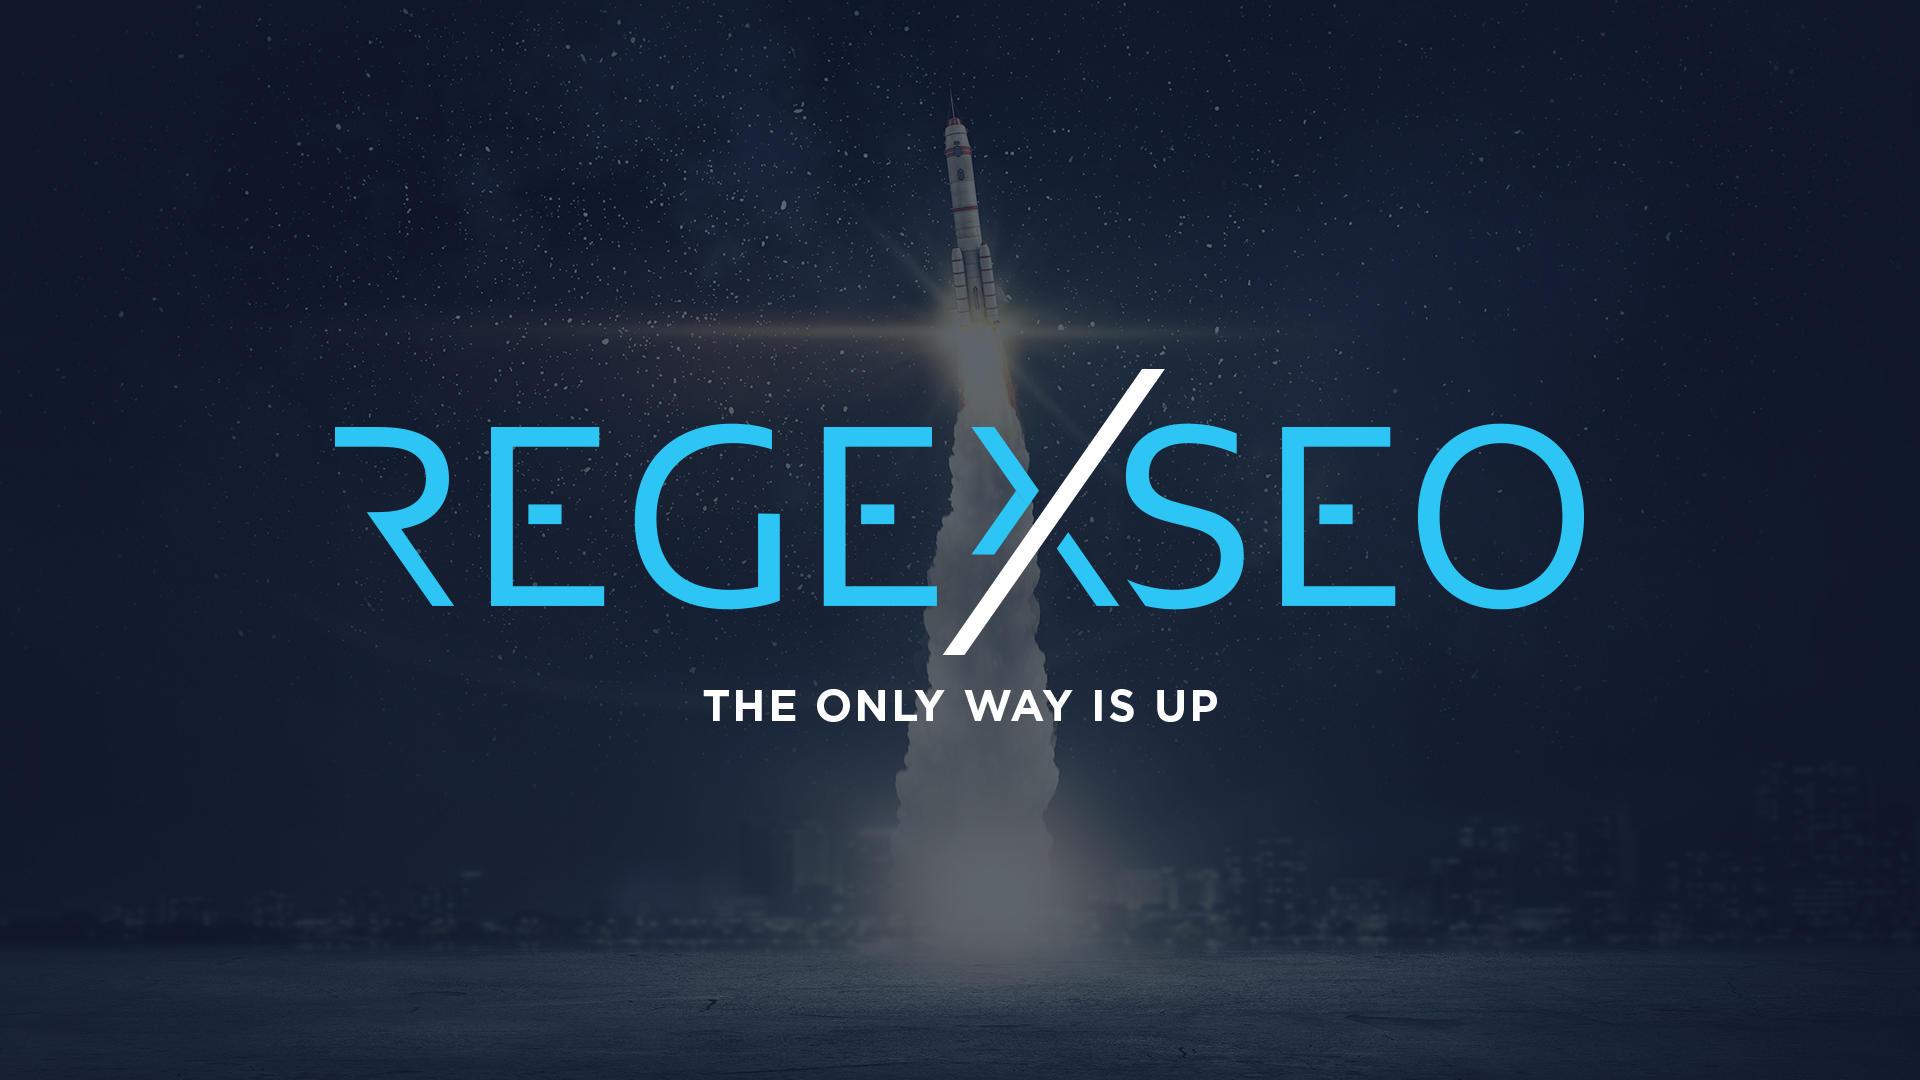 Regex SEO - Cypress TX image 0